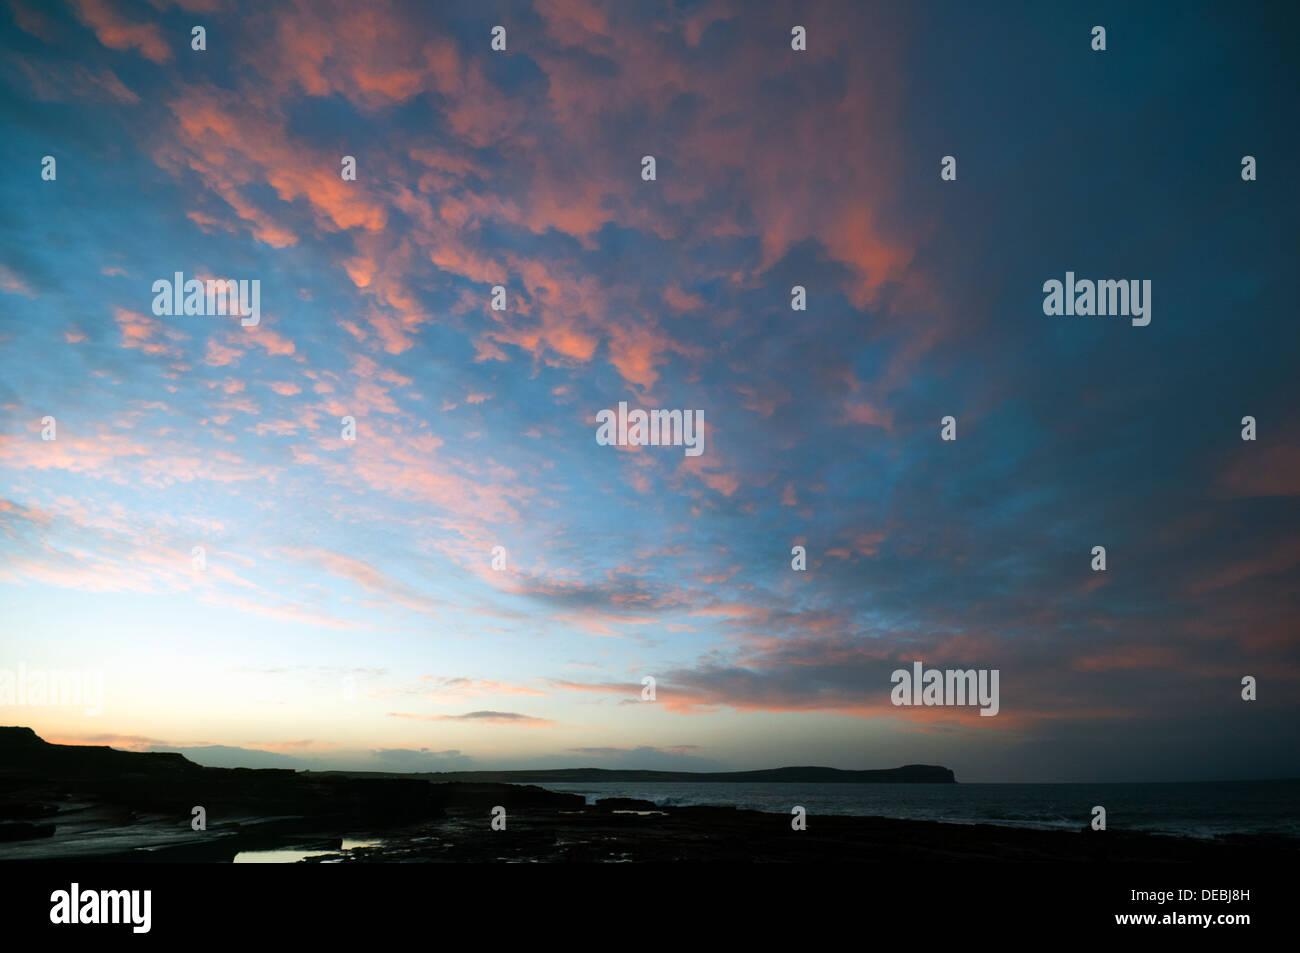 Sunset over Dunnet Head from near Skarfskerry, Caithness, Scotland, UK - Stock Image